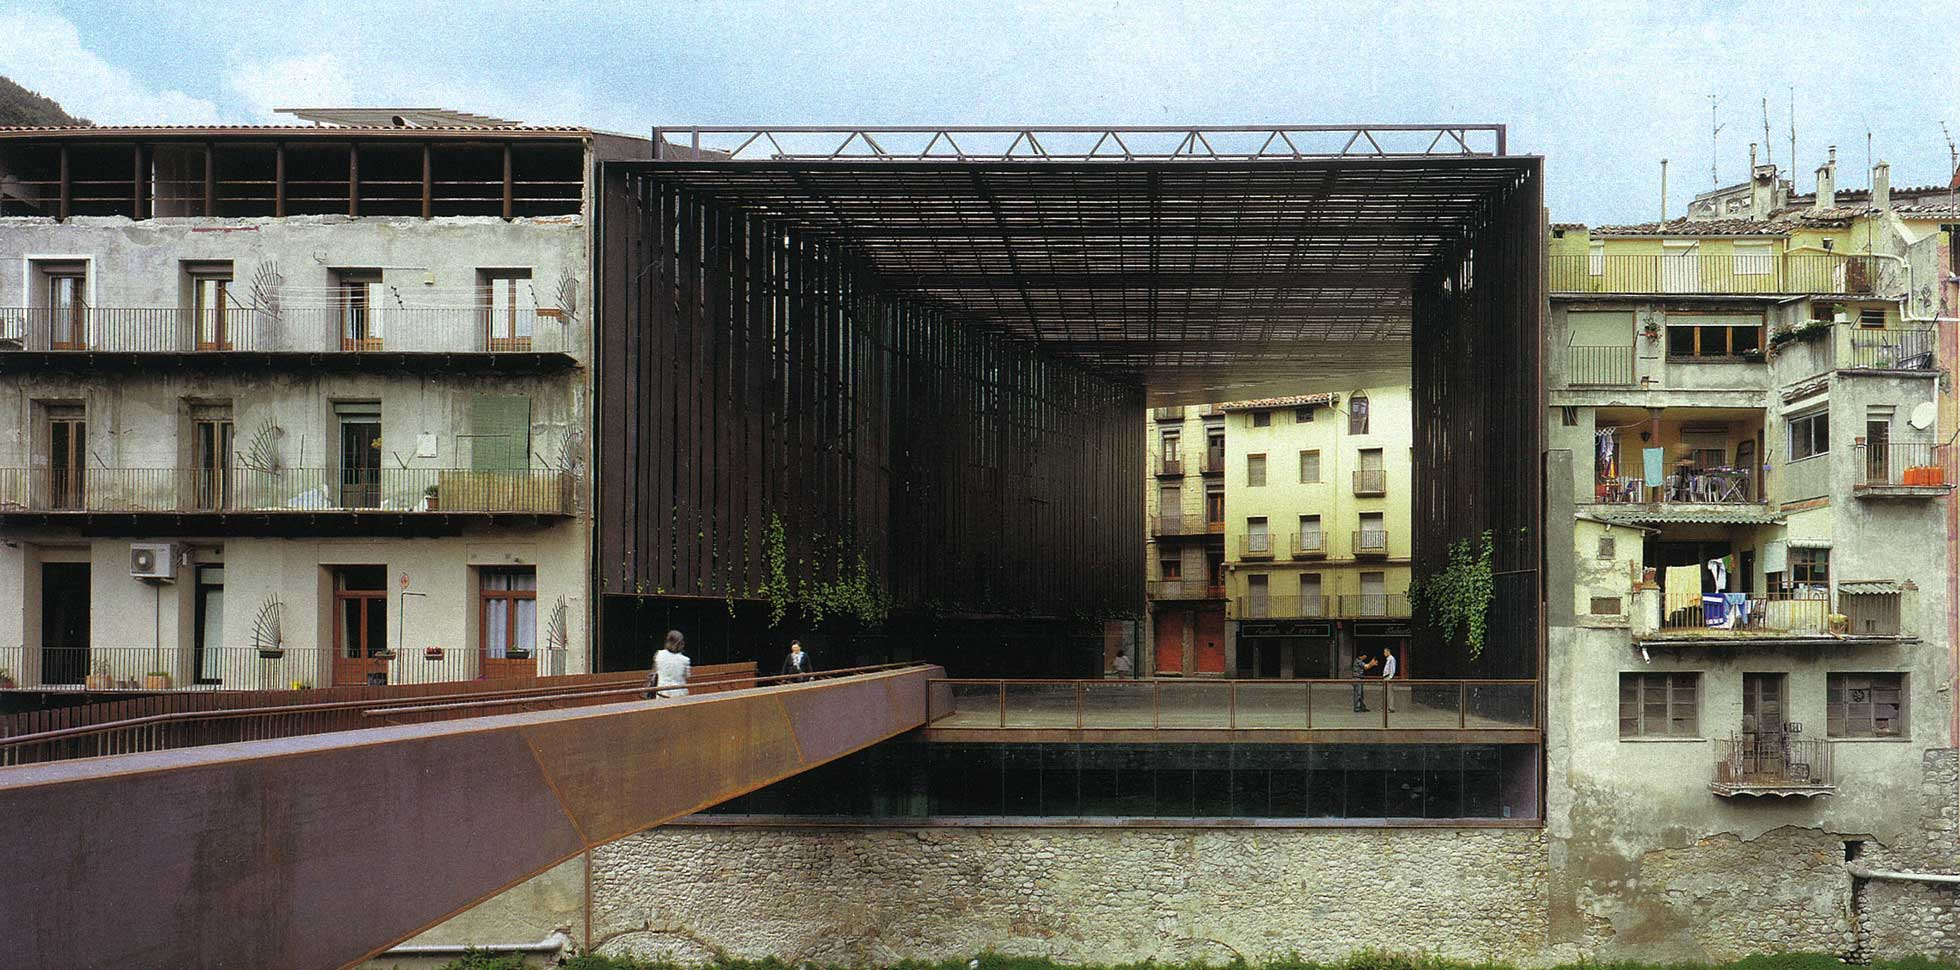 Structure architecture news - Arquitectura girona ...